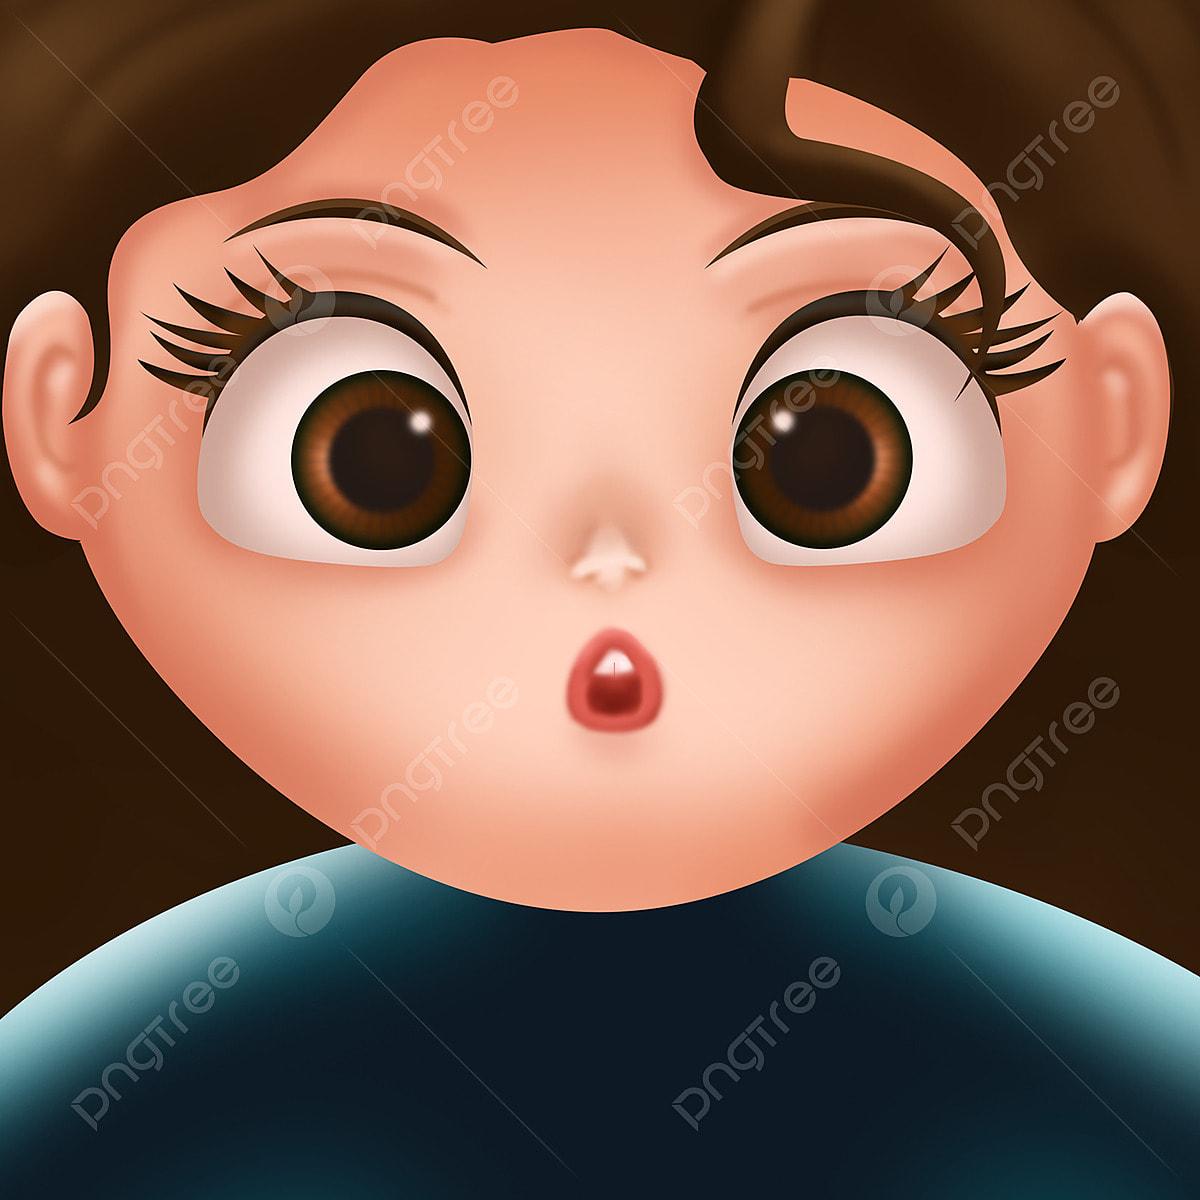 Cute Big Eyes Girl Cartoon Png Material Cute Girl Big Eyes Girl